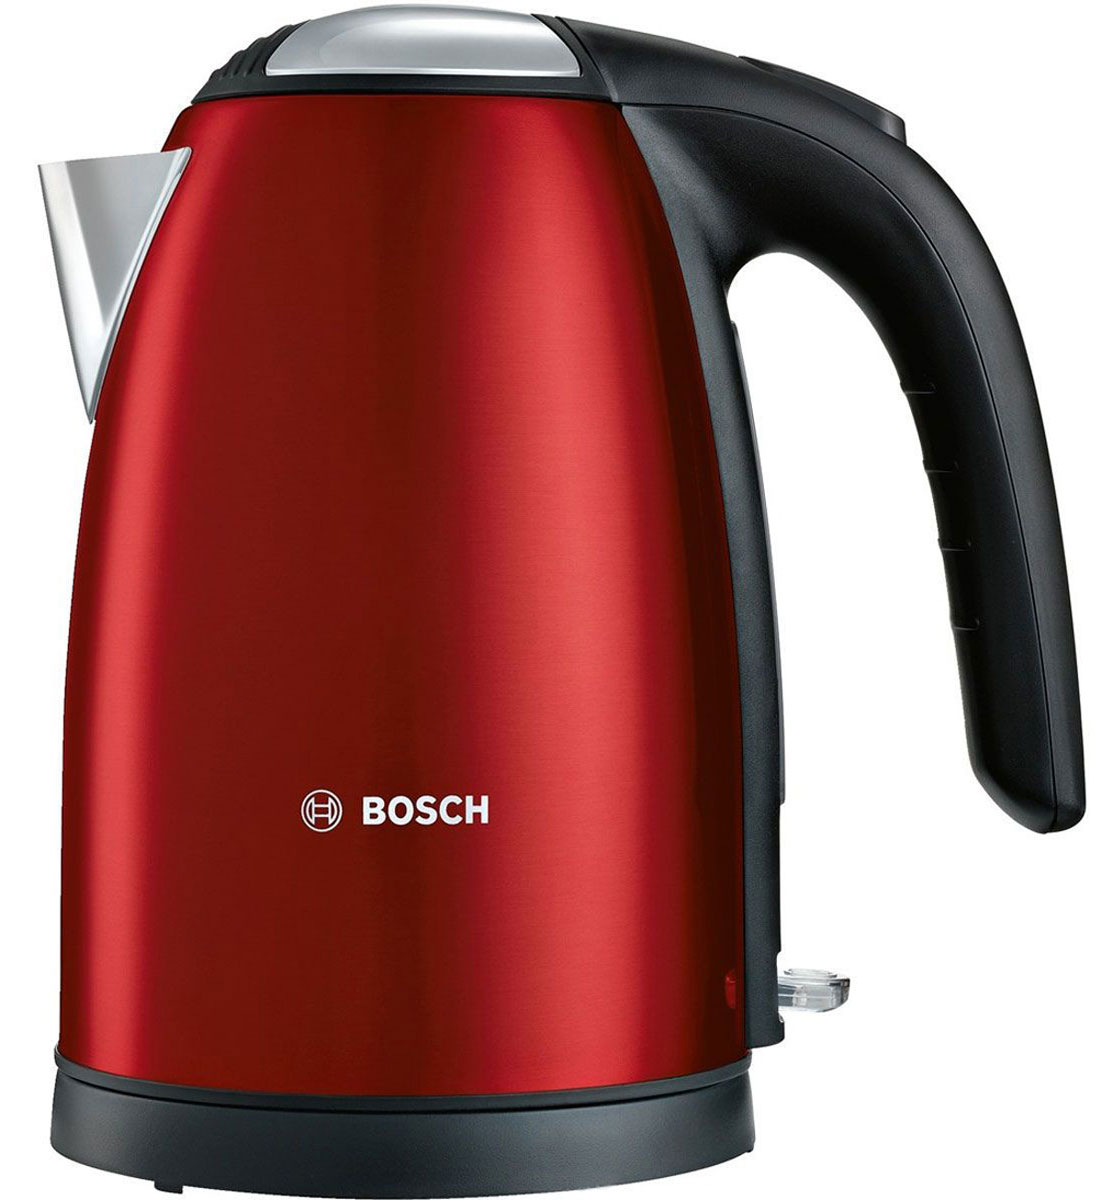 Bosch TWK7804, Red электрический чайник чайник электрический bosch twk7901